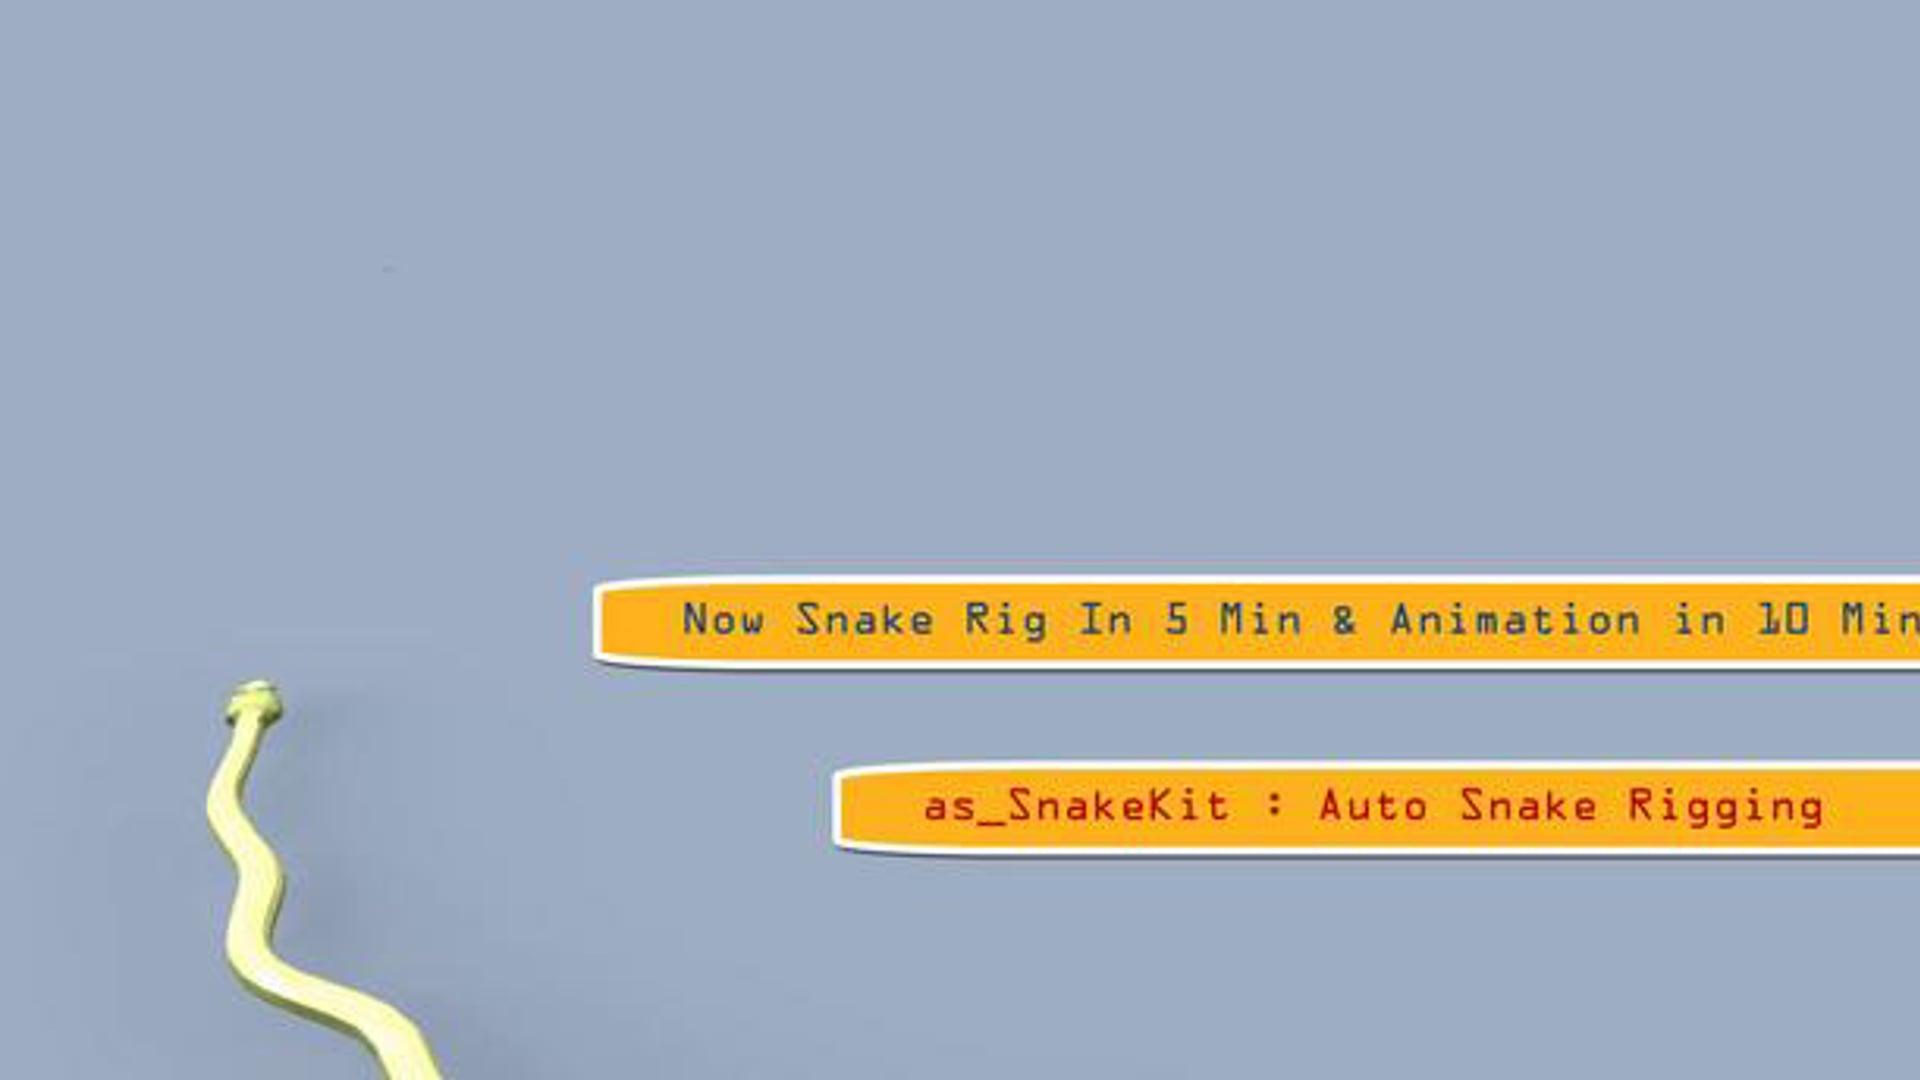 as_EasySnake : Snake Rigging Tools & Path Animation